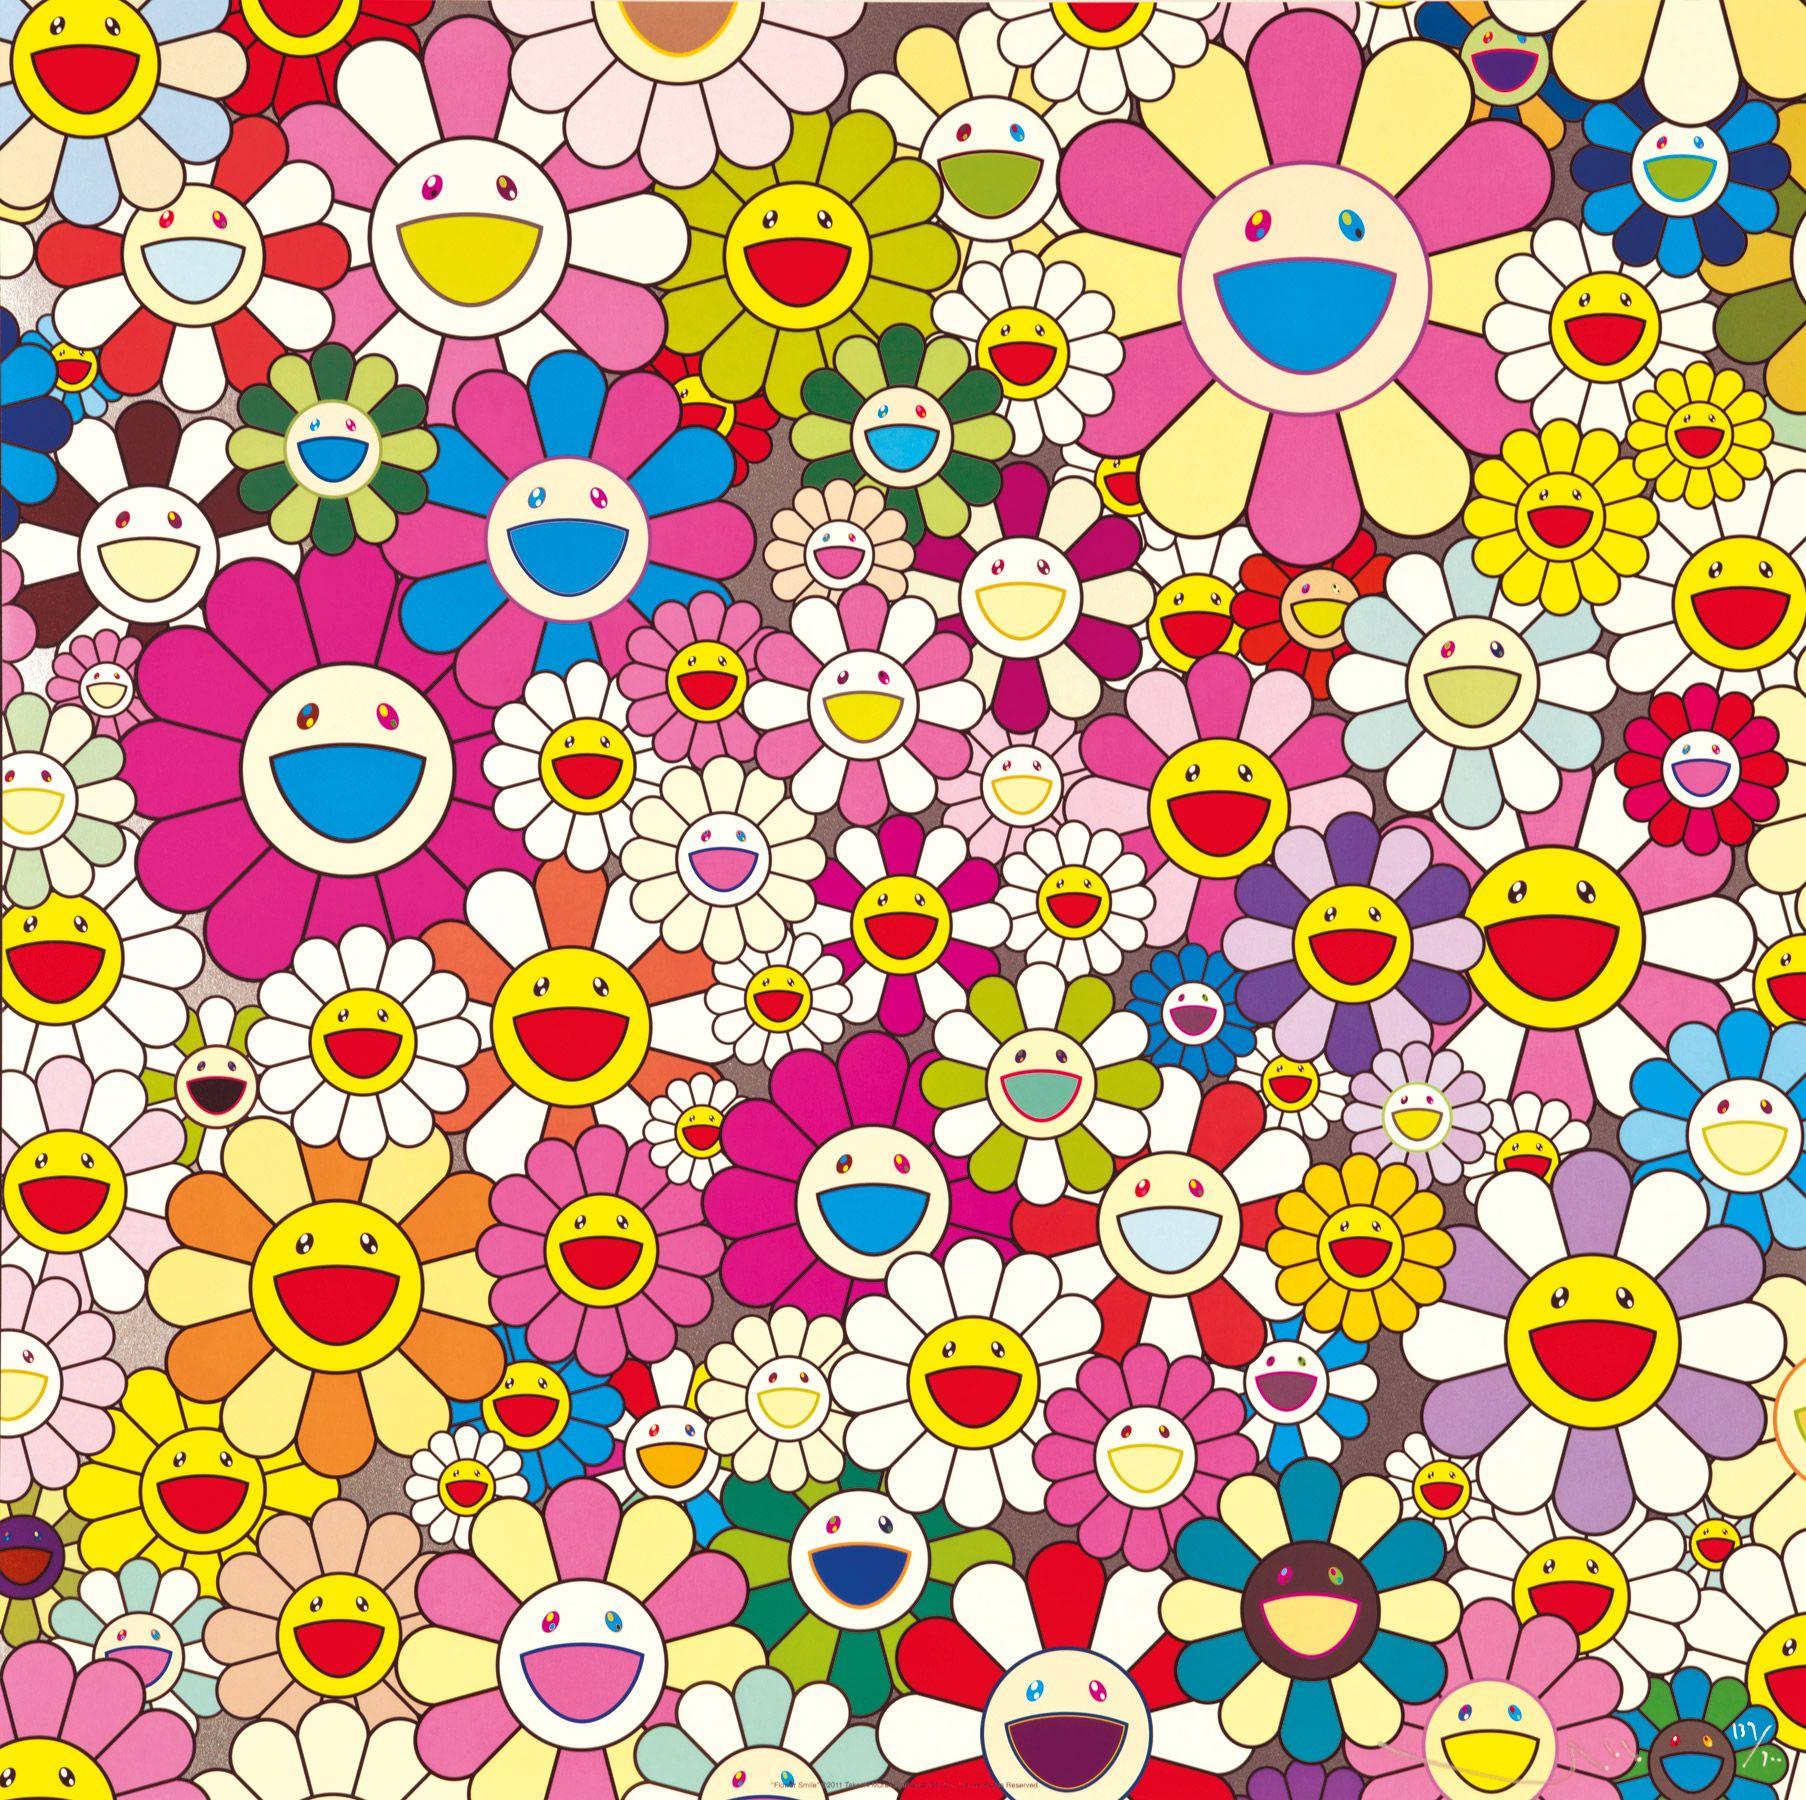 Joycie Bernstein // Gallery Intern // Takashi Murakami